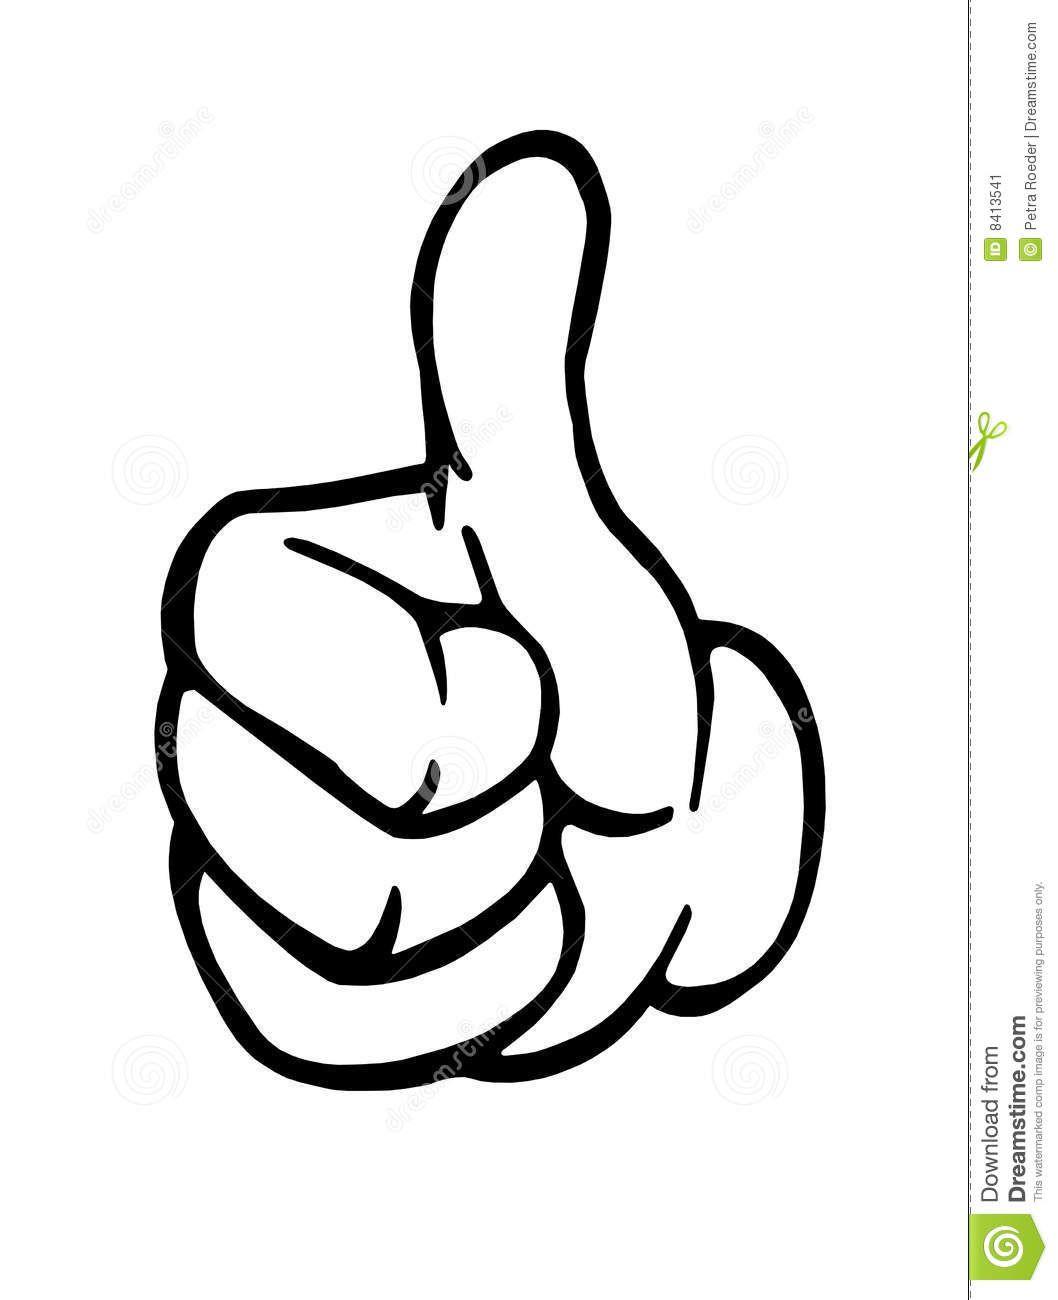 Thumbs up cute. Hand clipart clipartfox current